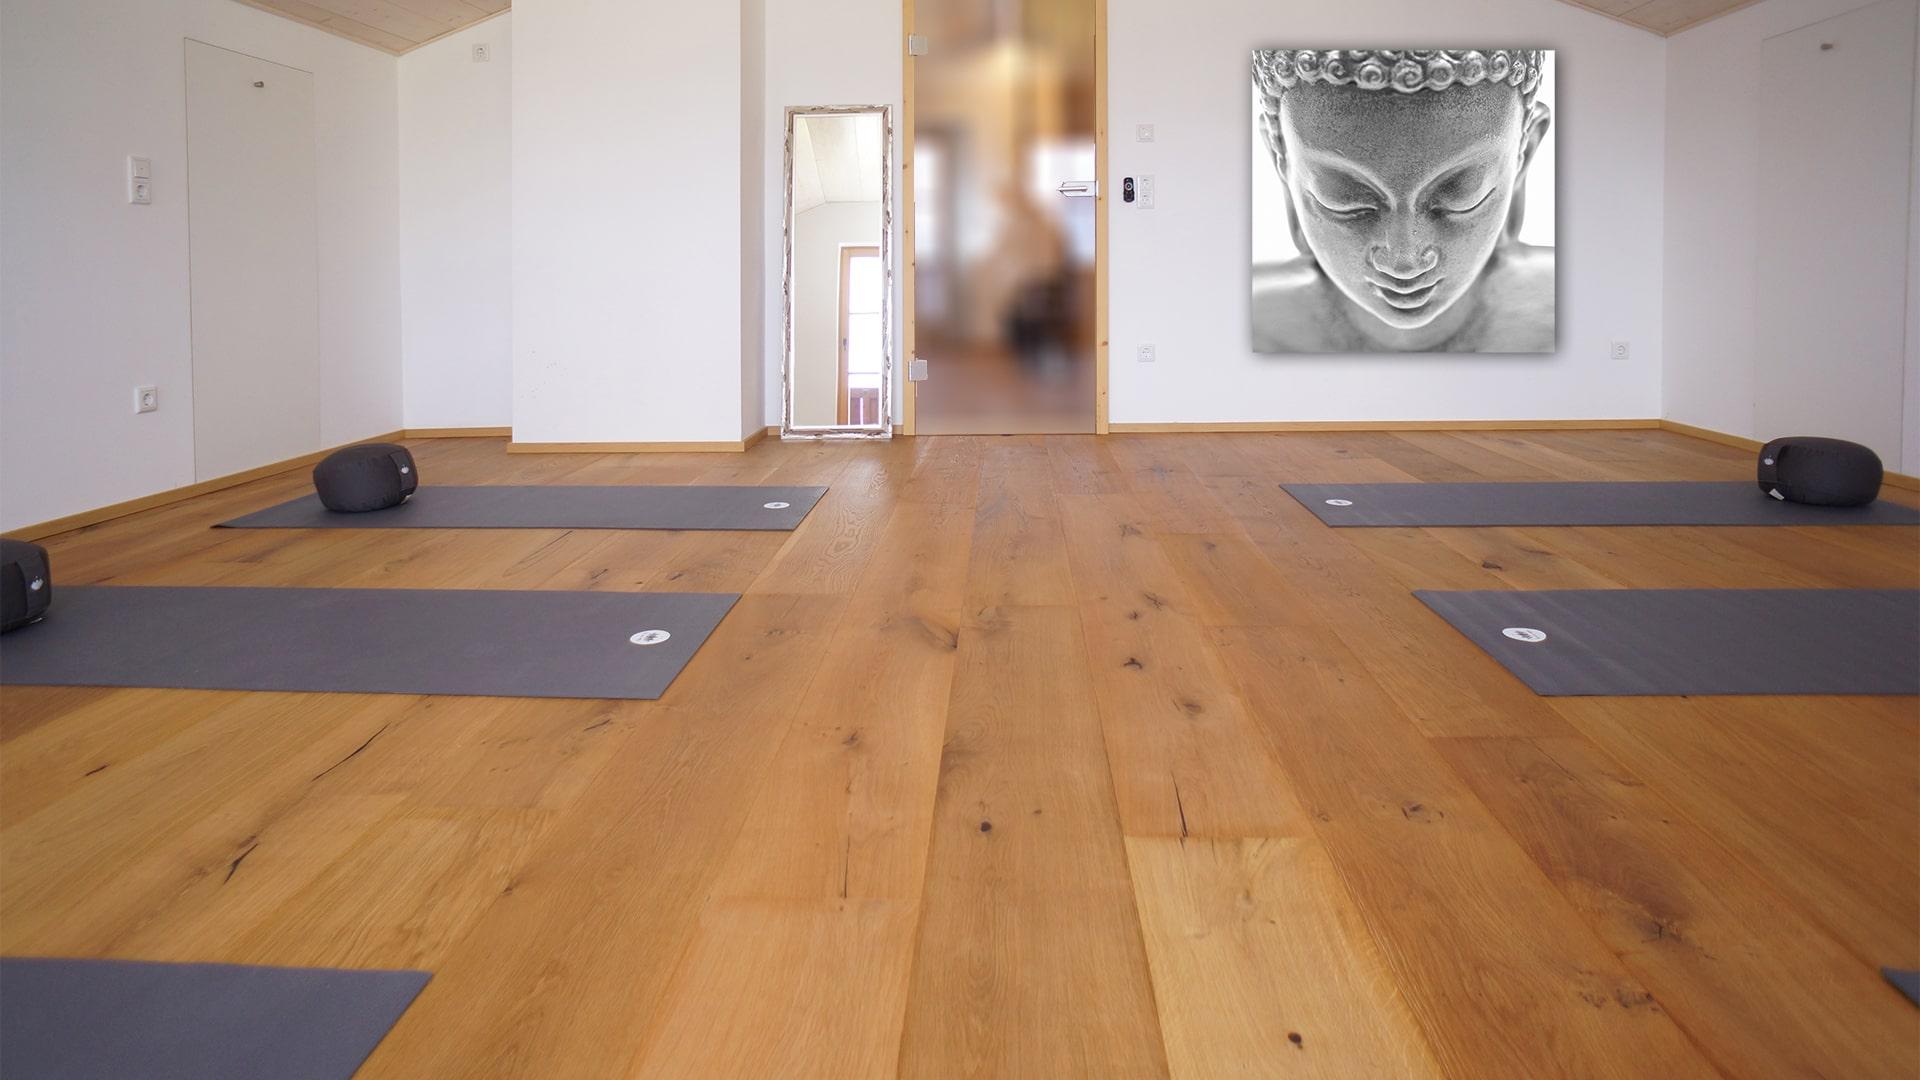 Yogaraum mit Buddhabild-min